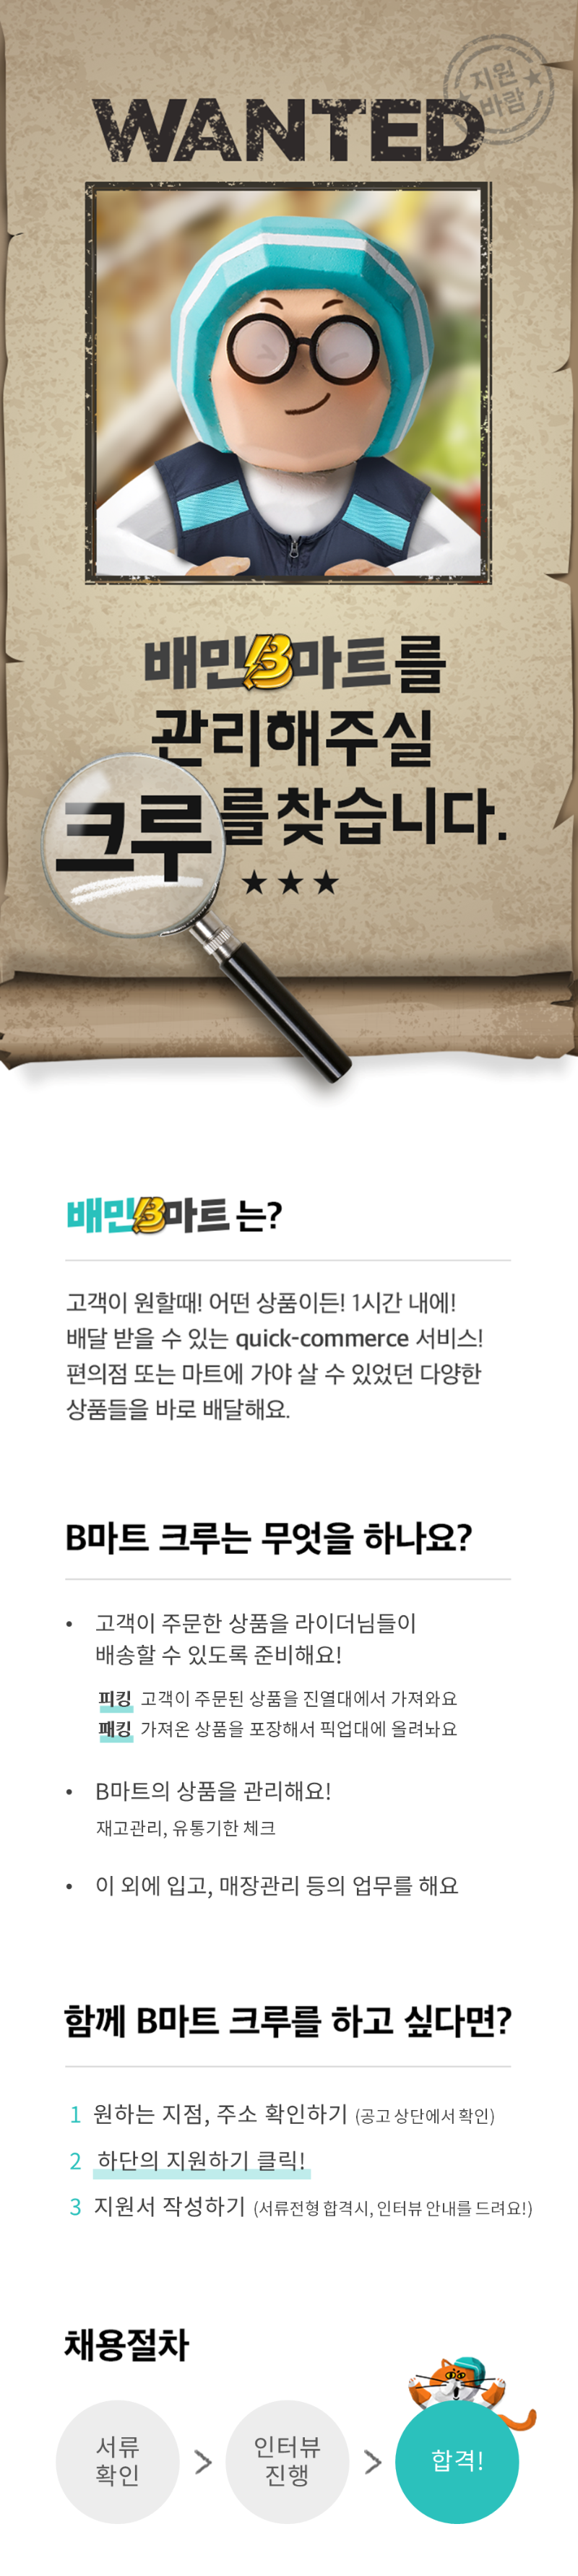 (B1) 메인_내용.png